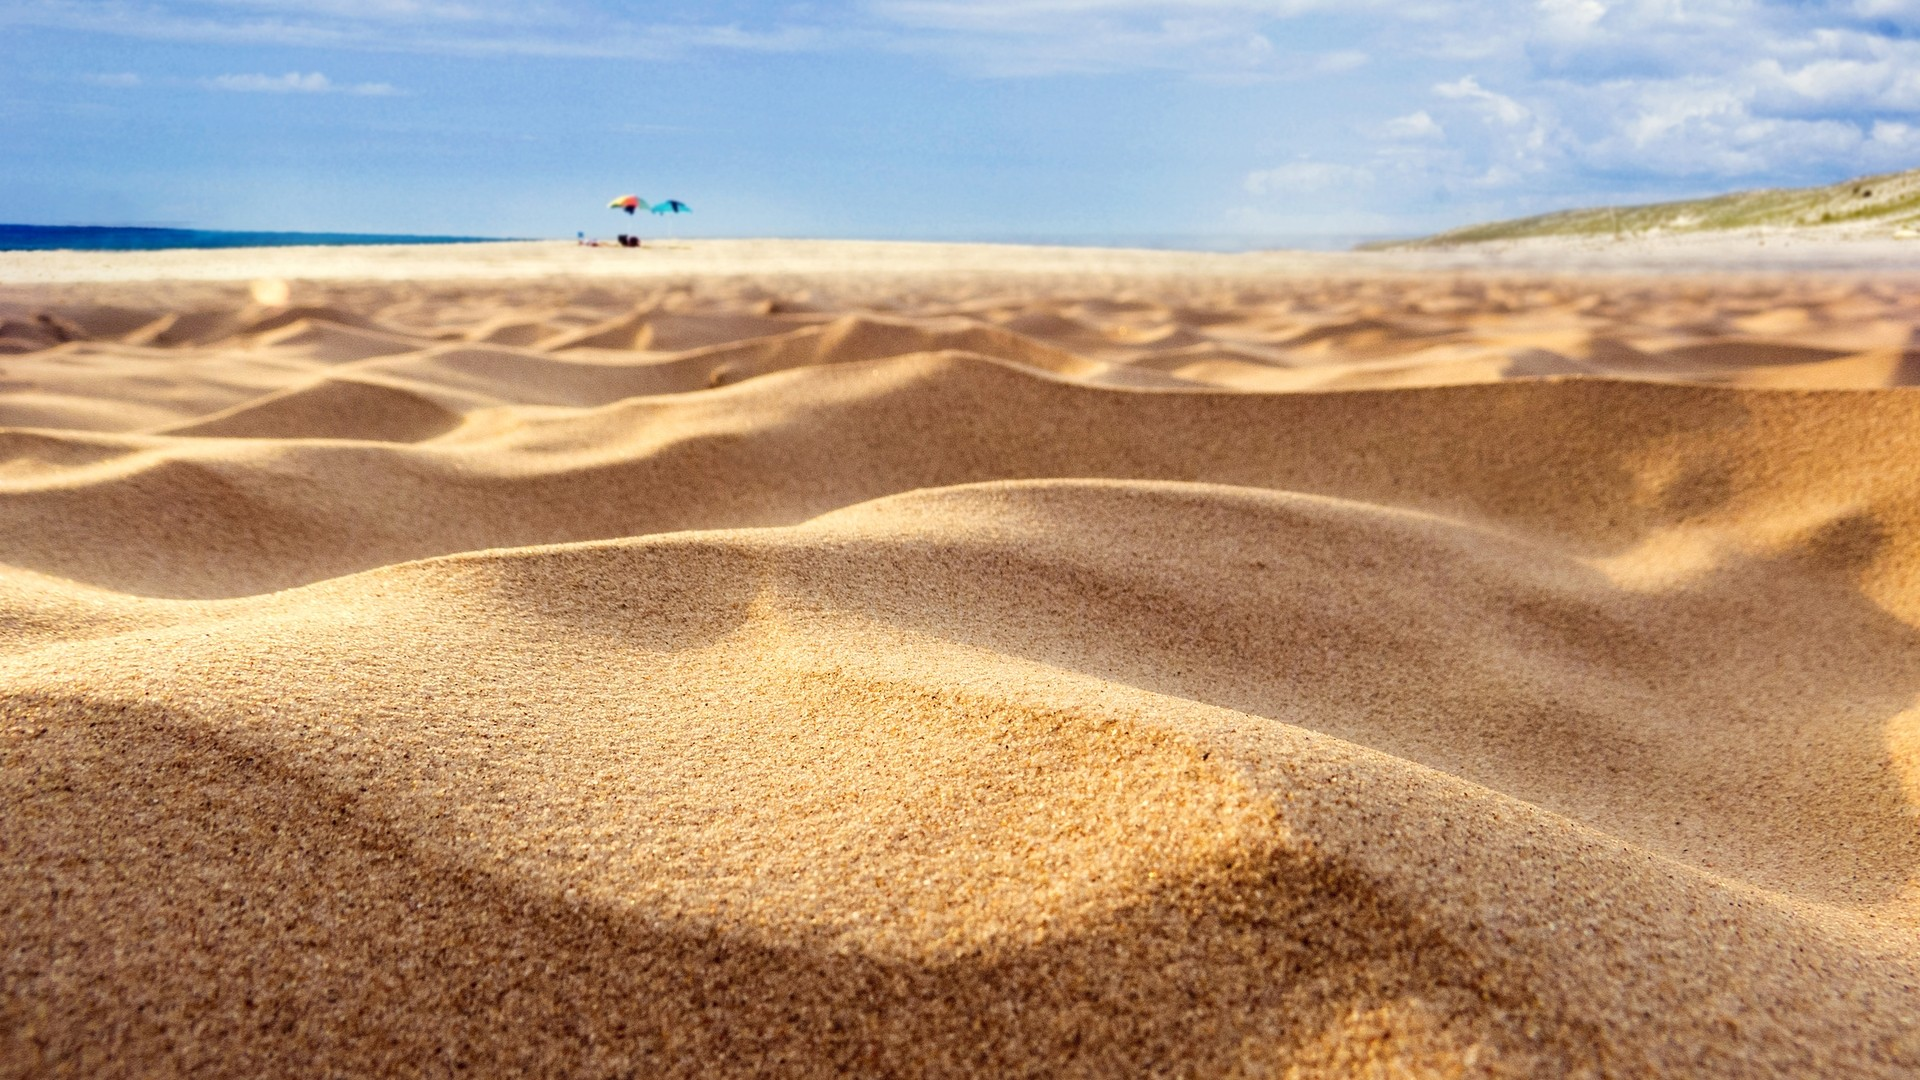 Sand Free Desktop Wallpaper